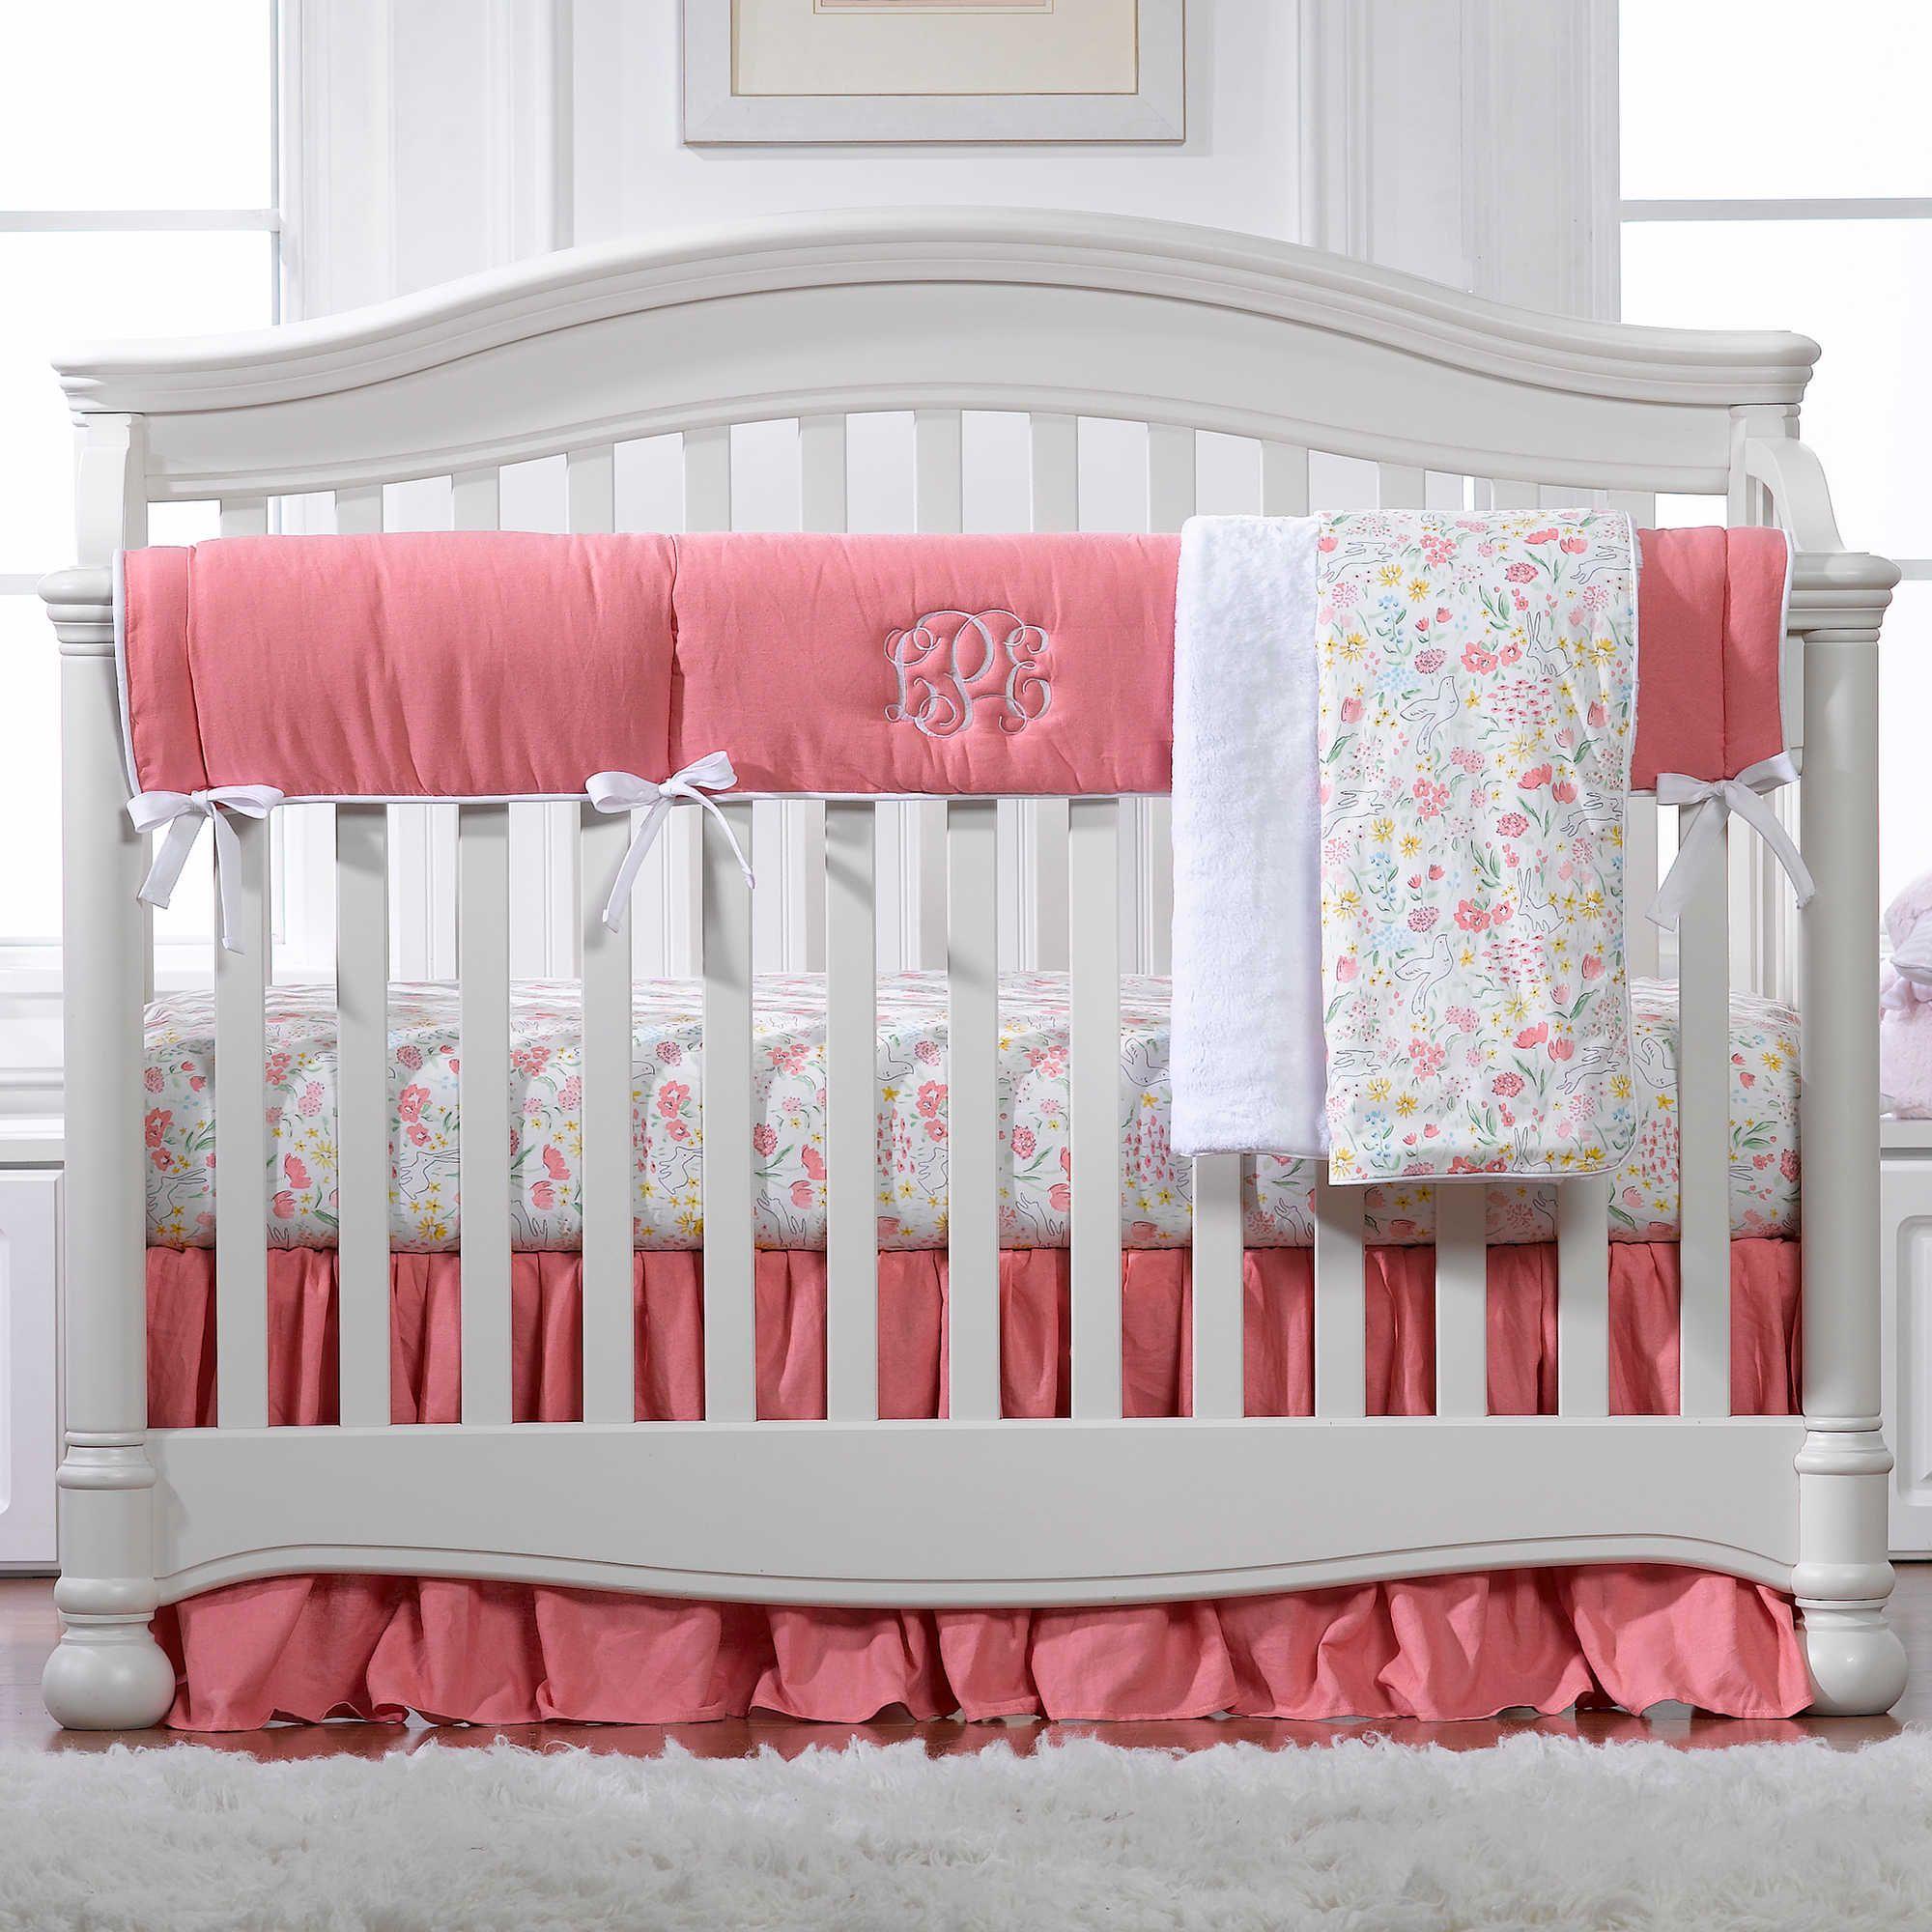 cribs cordelias girl floral products baby pastel lavender crib s bold pink blue hydrangea set cordelia bedding ruffle